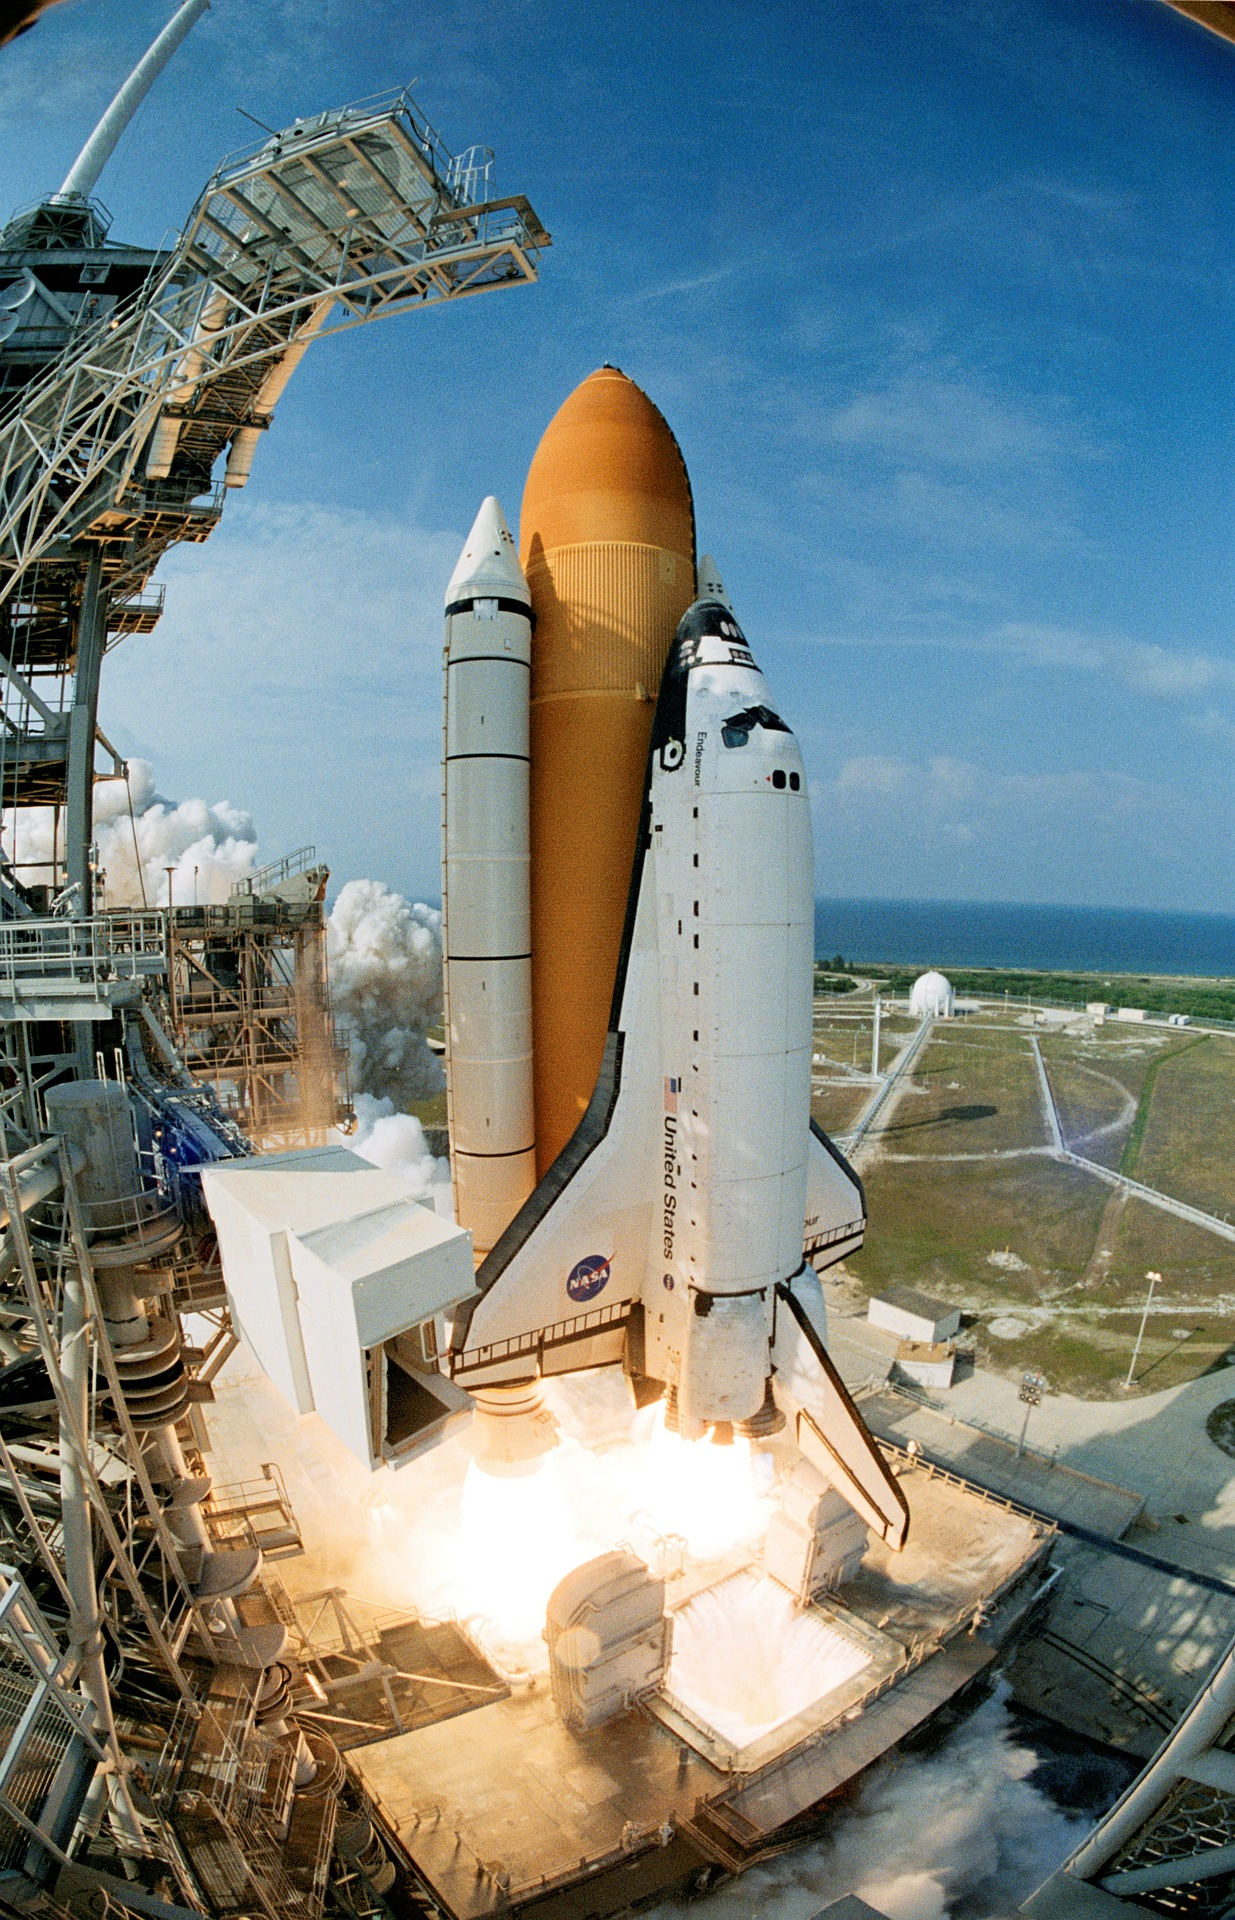 Space Shuttle Launch, Launch, Mission, Nasa, Shuttle, HQ Photo